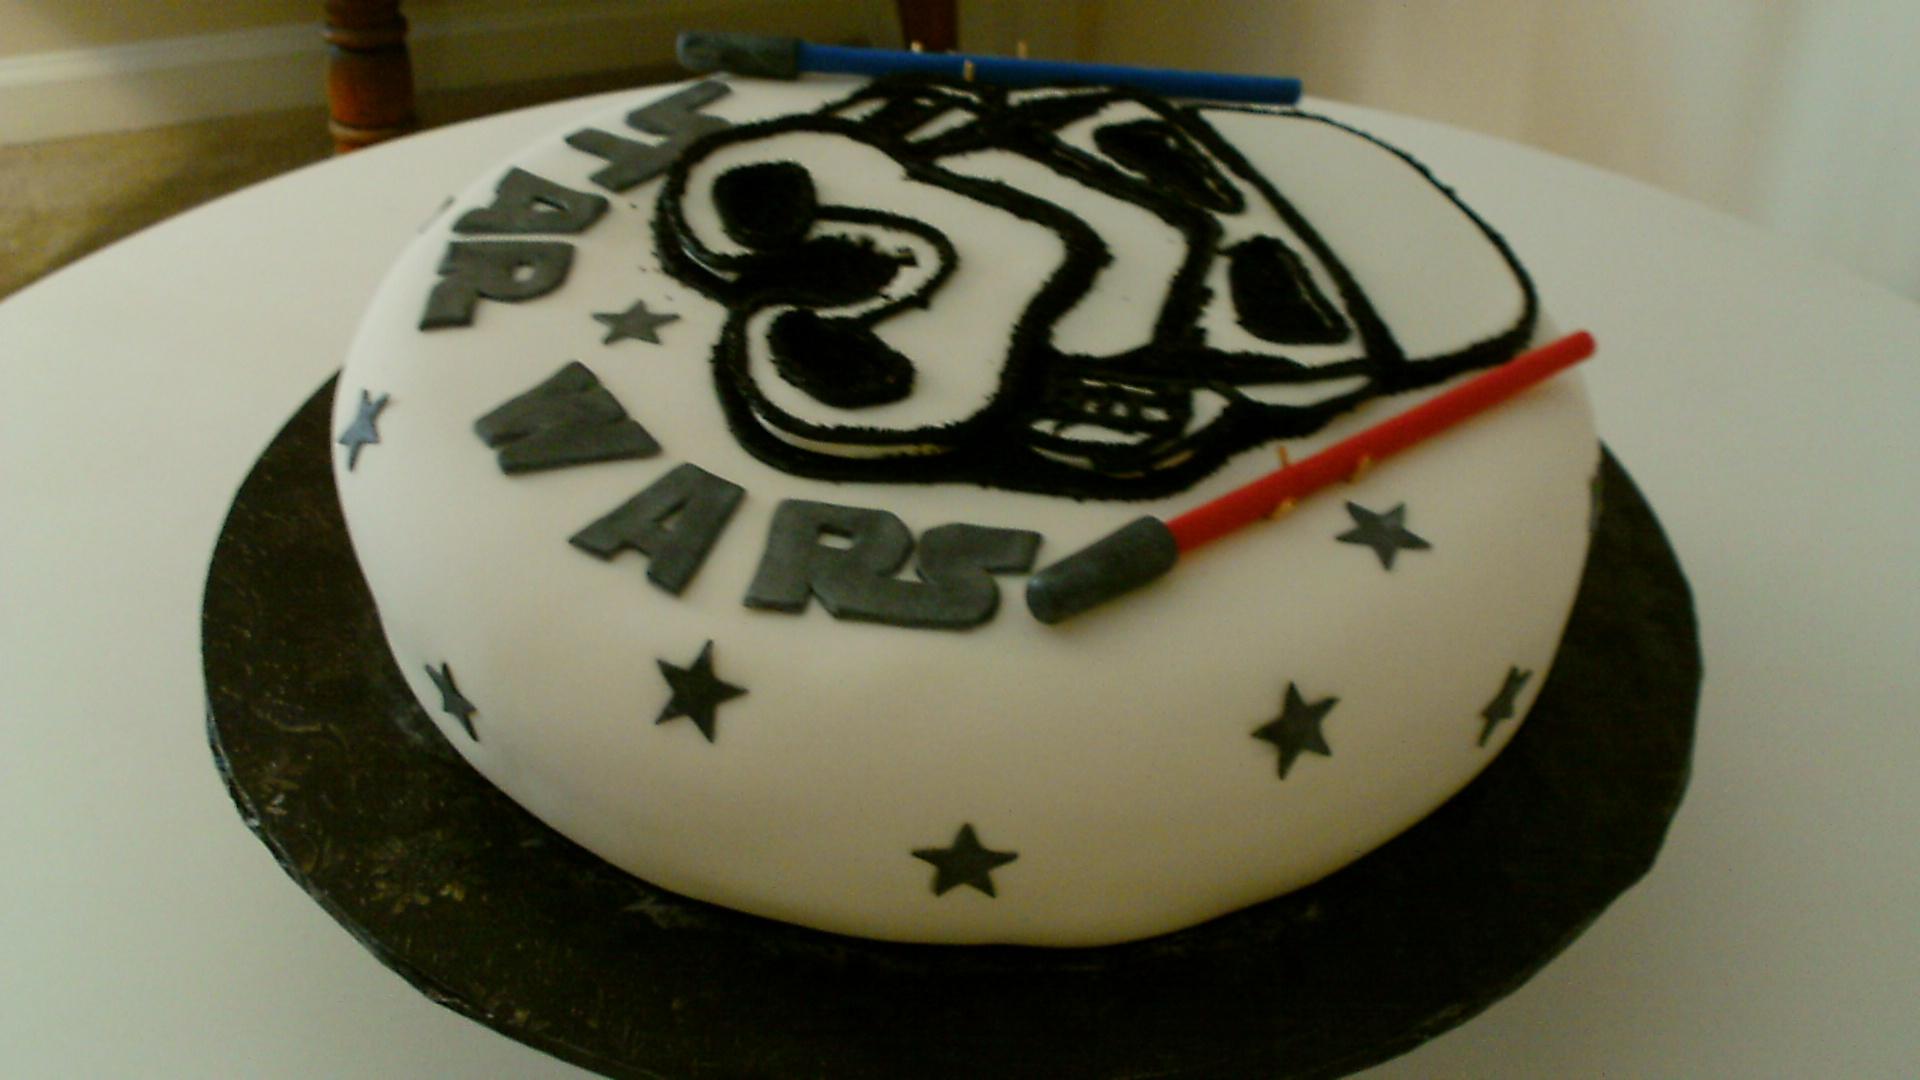 Phenomenal Star Wars Theme Birthday Cake With A Stormtrooper Mask With Light Personalised Birthday Cards Vishlily Jamesorg